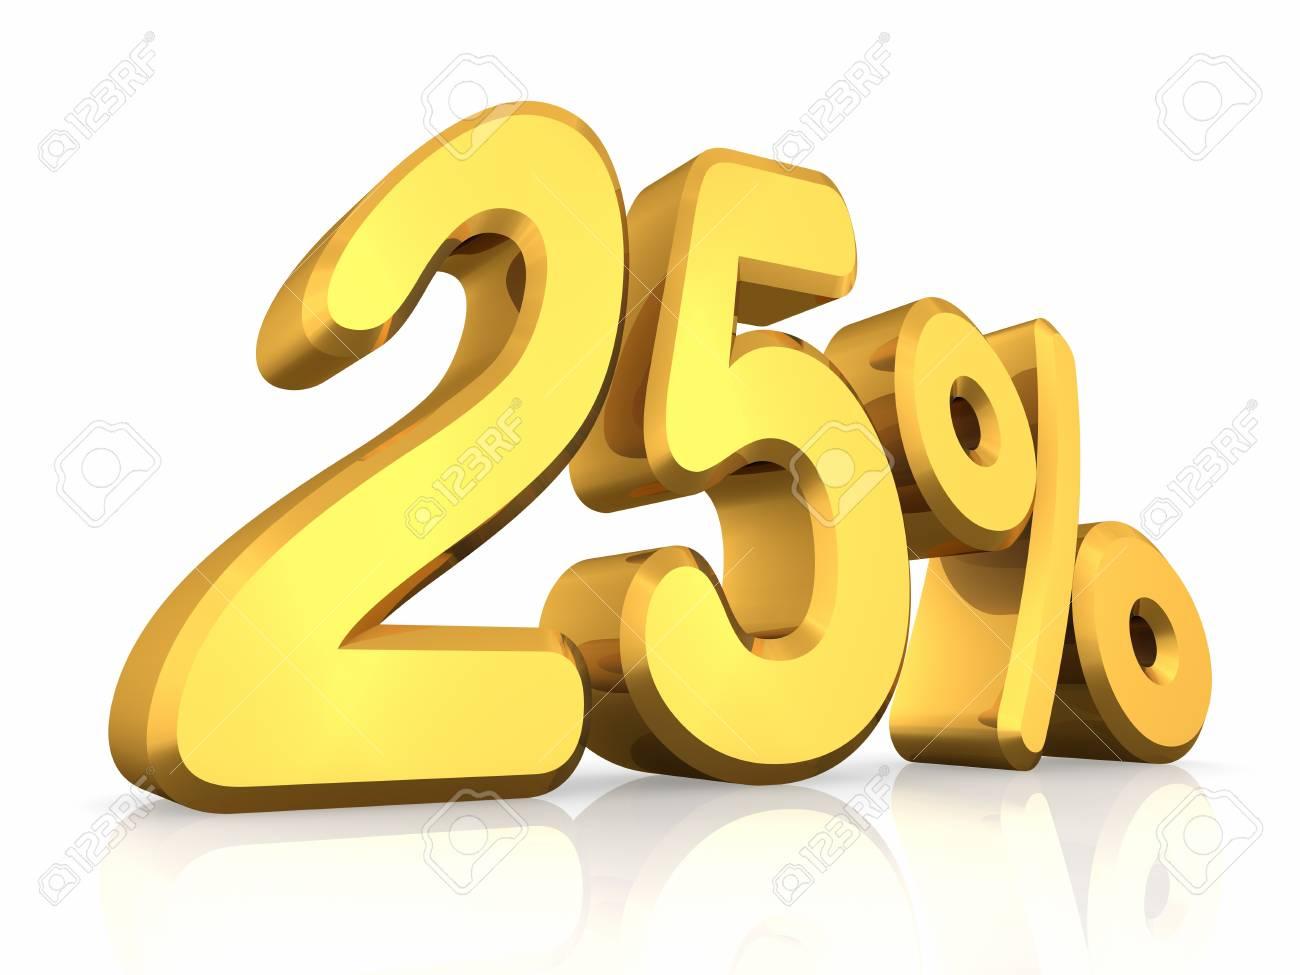 Gold twenty five percent, isolated on white background. 25% Stock Photo - 8552905